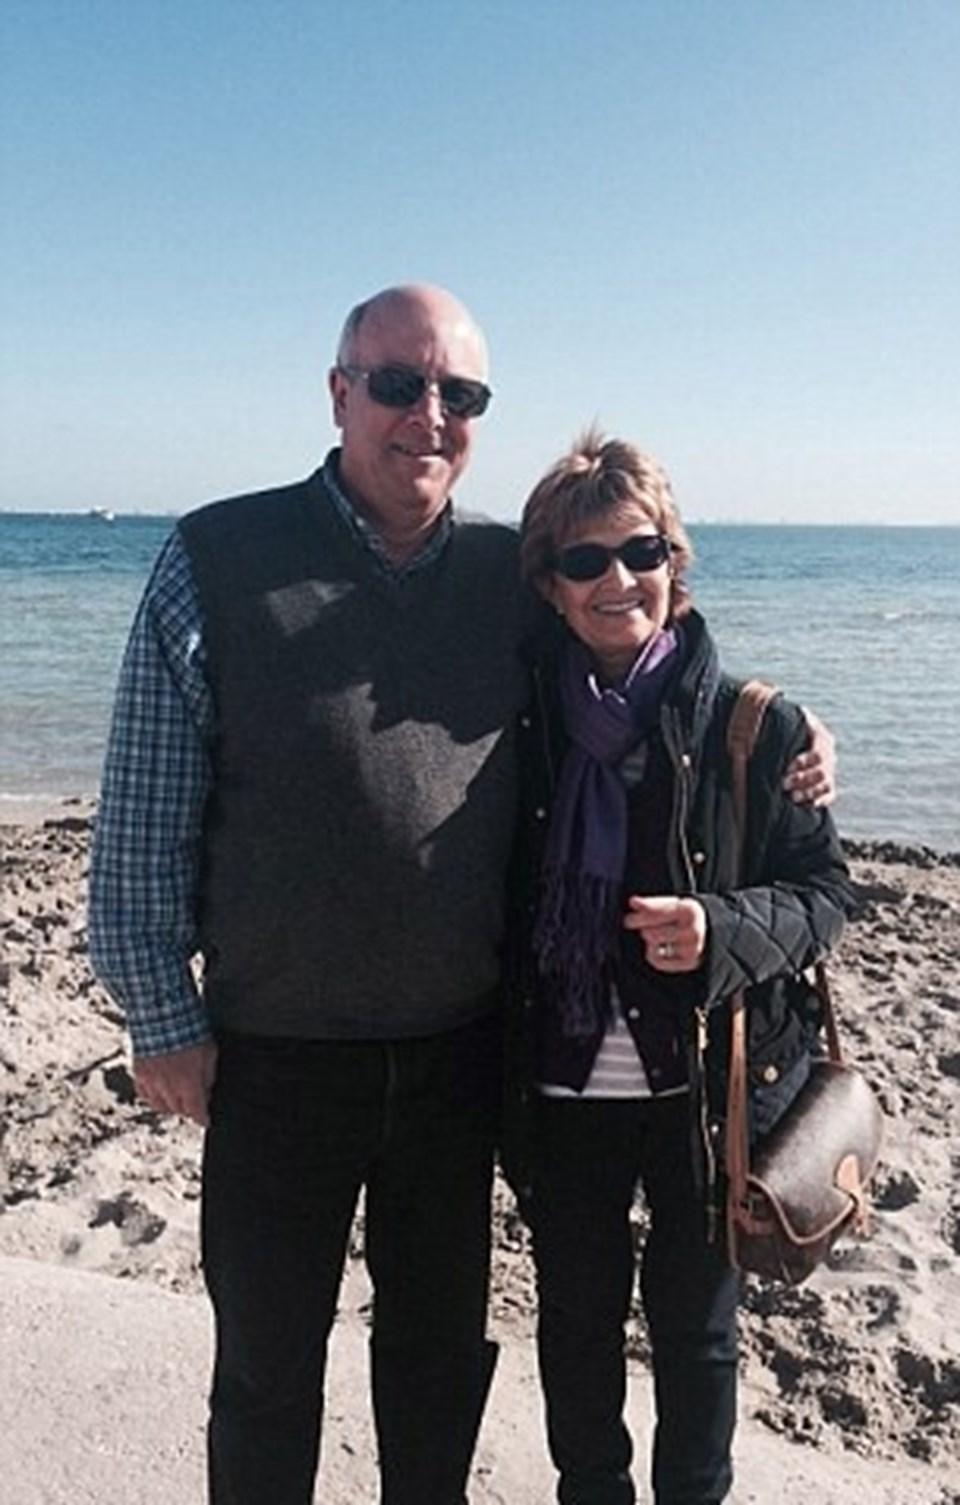 Christopher and Julie Nairn çifti,Katrina Smith ve Alan Lane'e evlerini açtı.